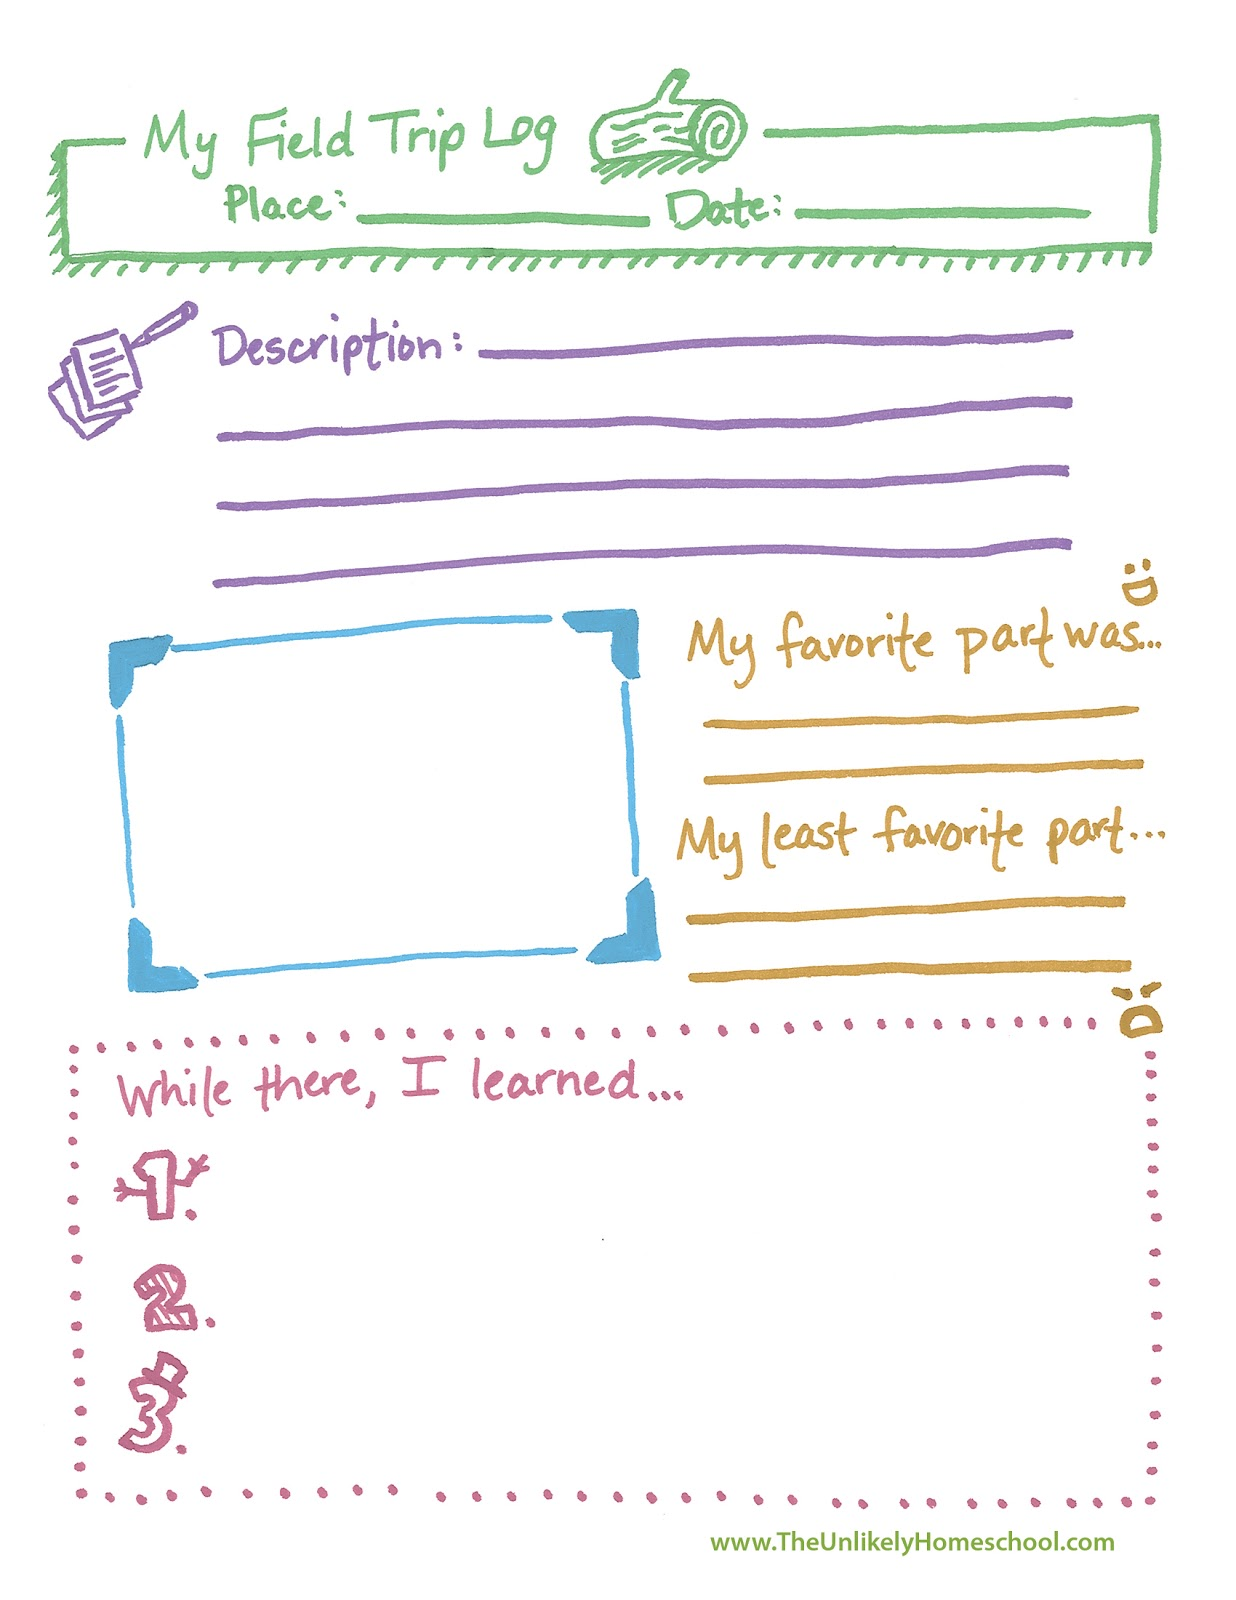 the unlikely homeschool field trip log printable. Black Bedroom Furniture Sets. Home Design Ideas